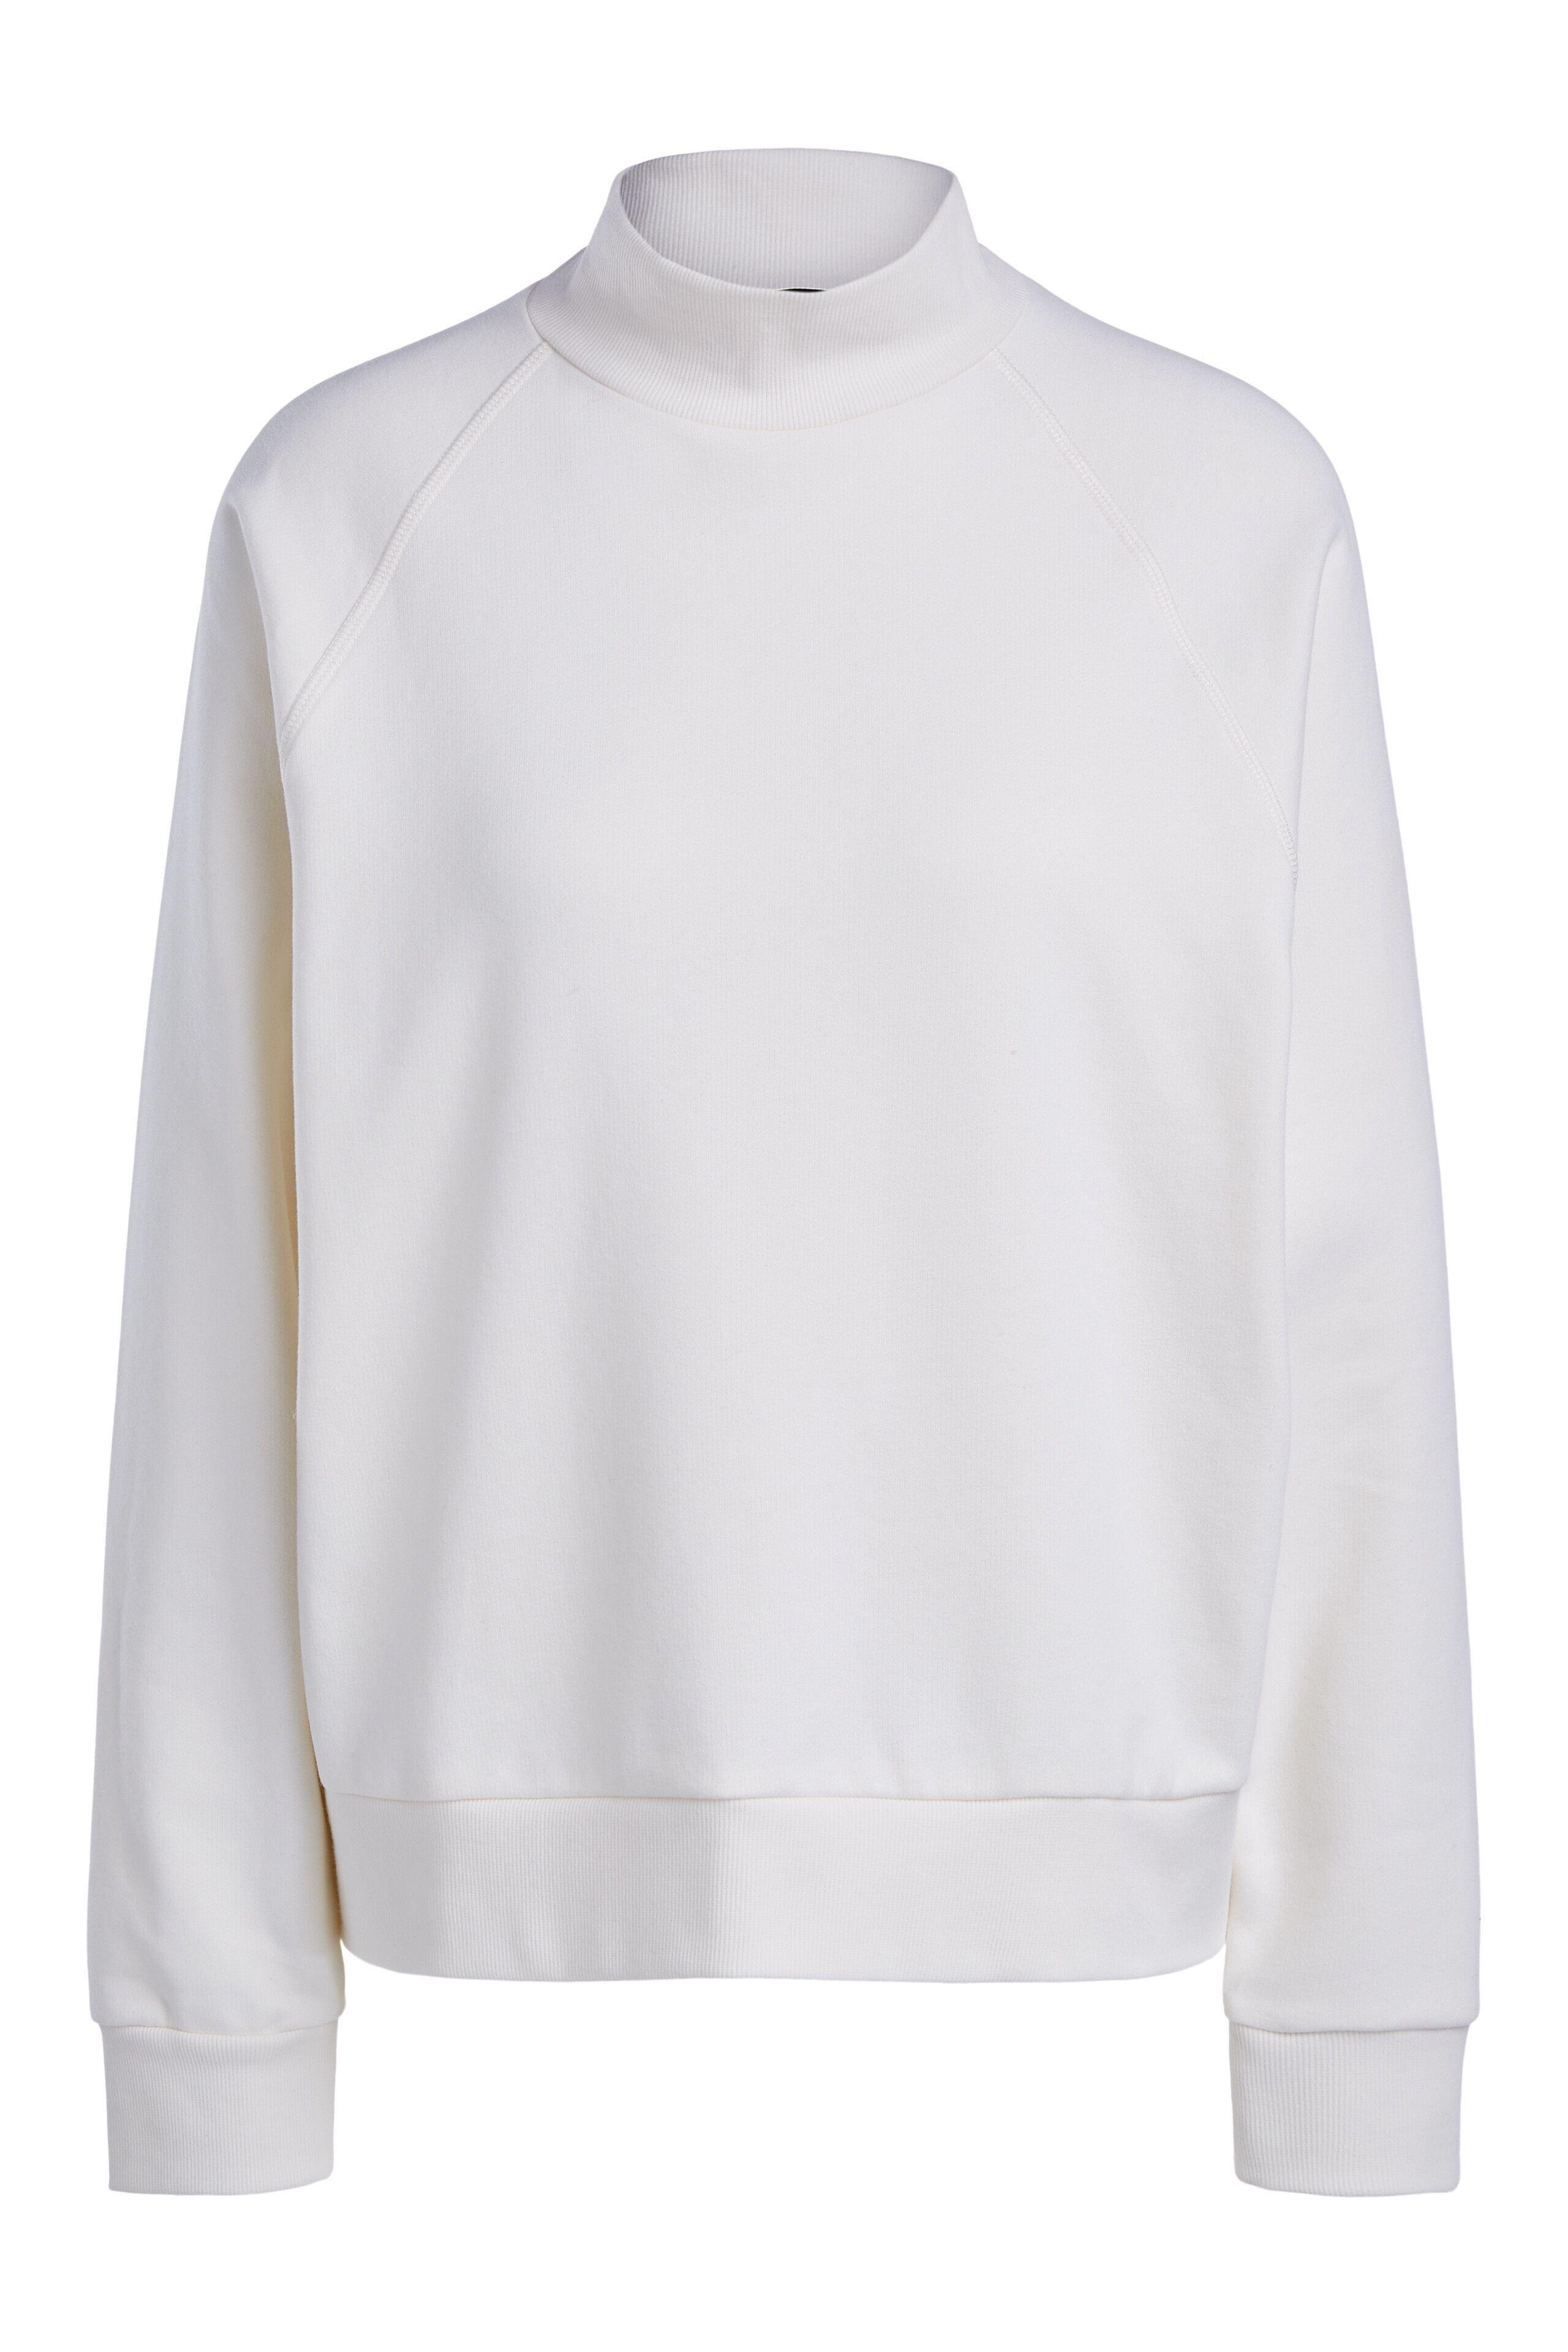 SET - Damen Sweatshirt - Off White